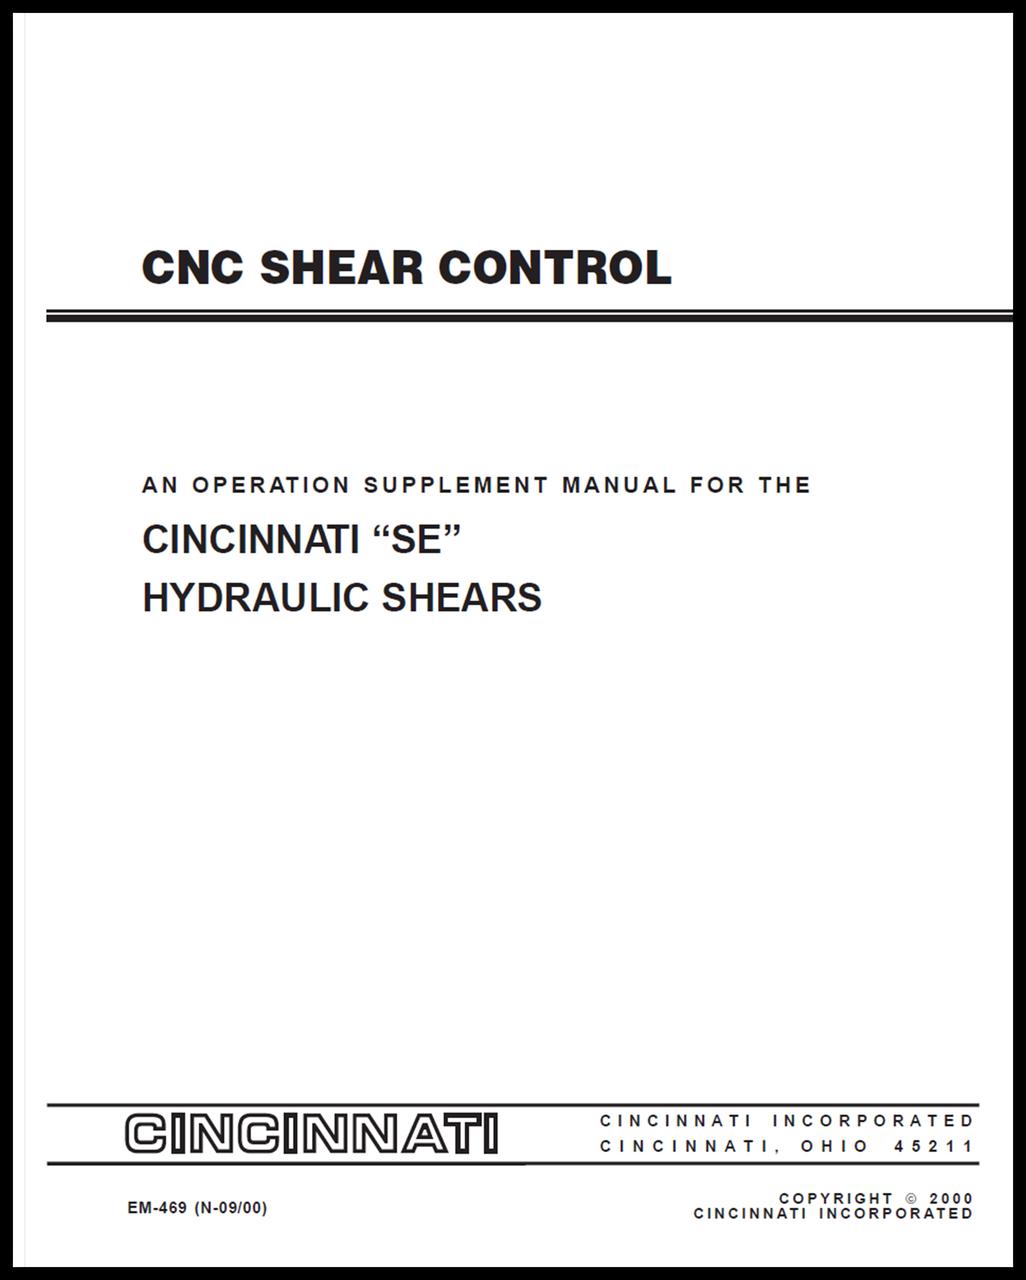 EM-469 (N-09-00) CNC Shear Control - An Operation Supplement Manual for the SE Hydraulic Shears